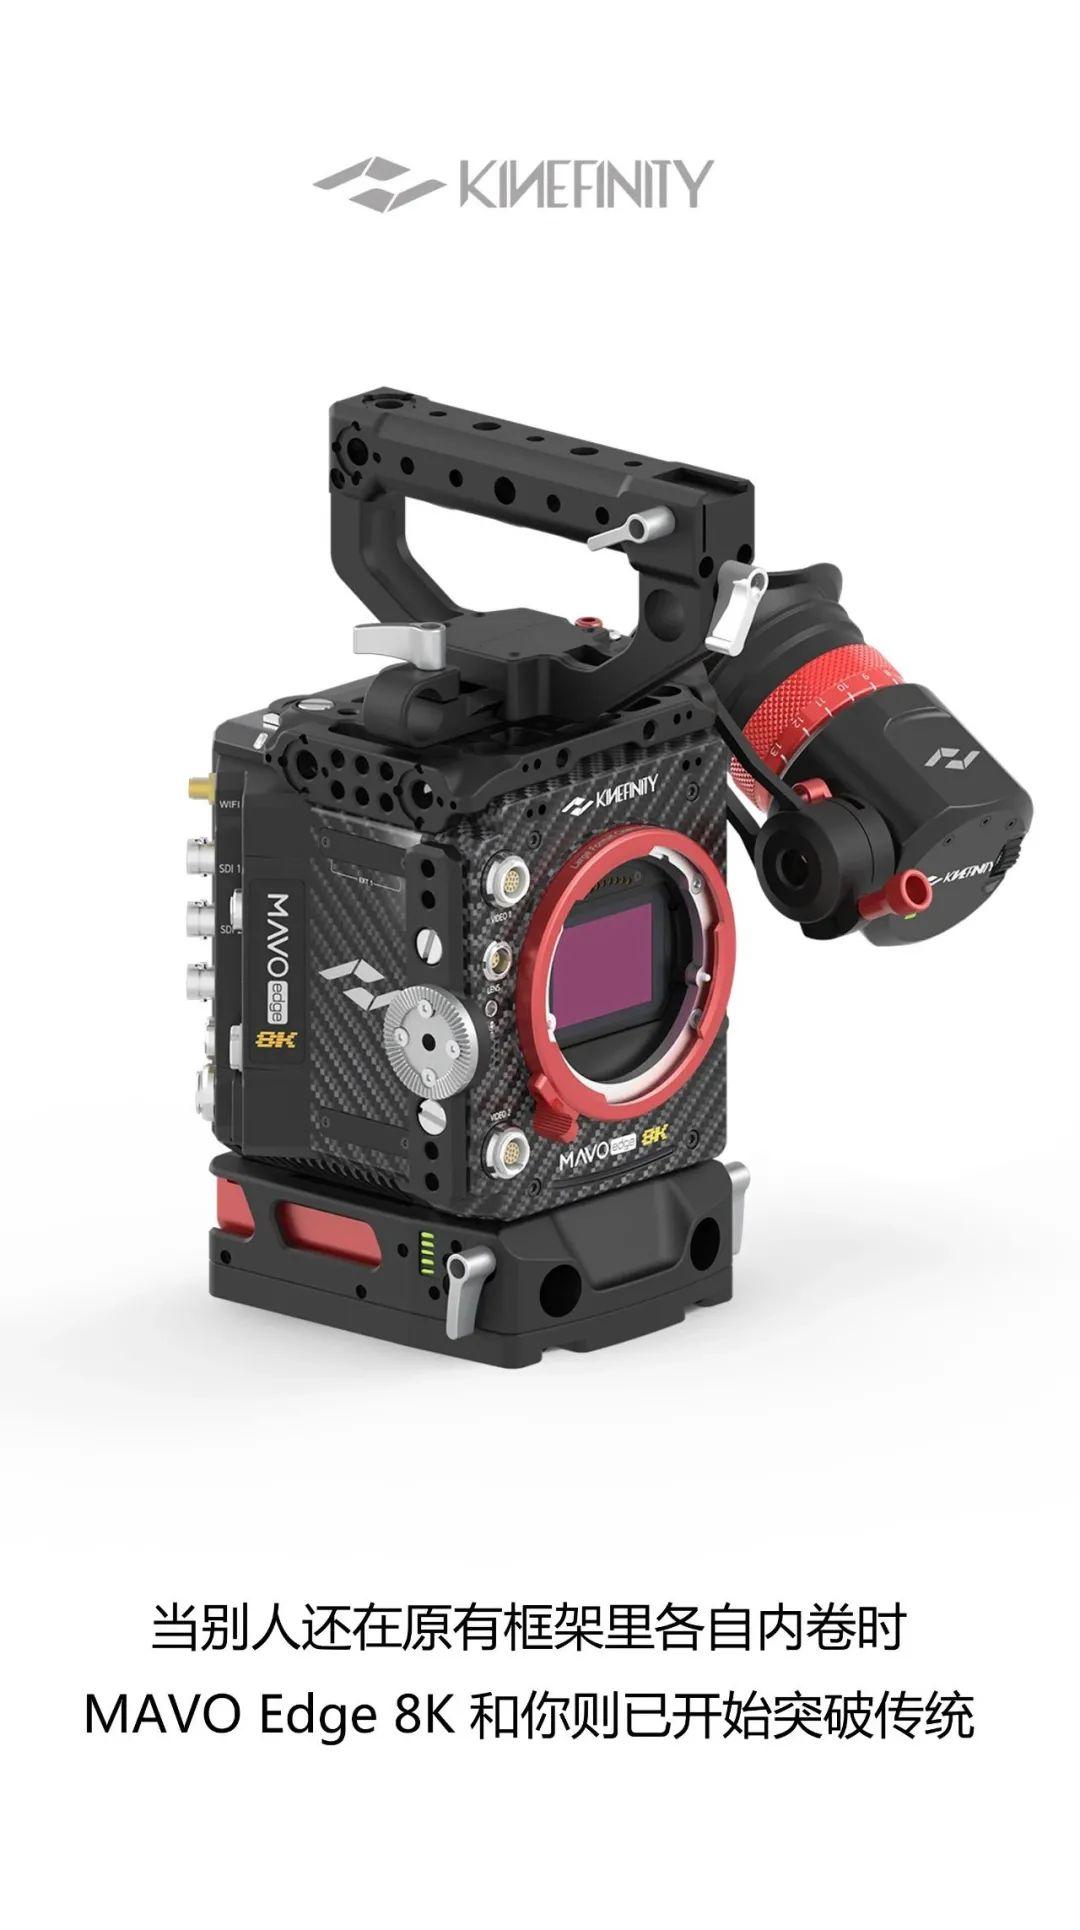 MAVO Edge 8K 正式发售! 8K摄影机 第1张